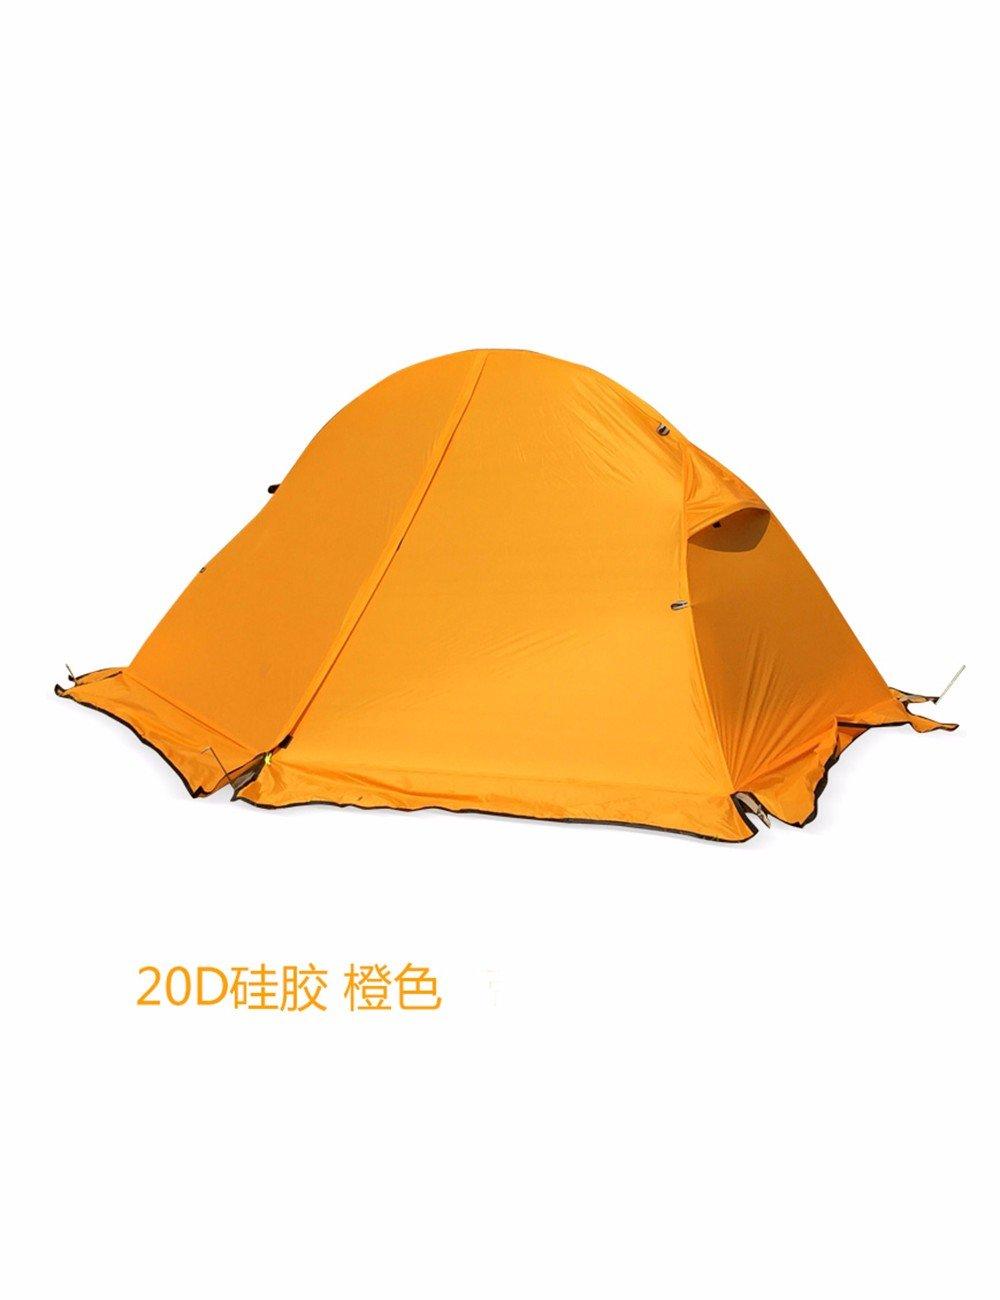 SJQKA-Die einzelne Person Zelt, Ultra-Light 20 Die Silica Gel Anti-Riot Zelt, Regen Doppel Camping Zelt Outdoor